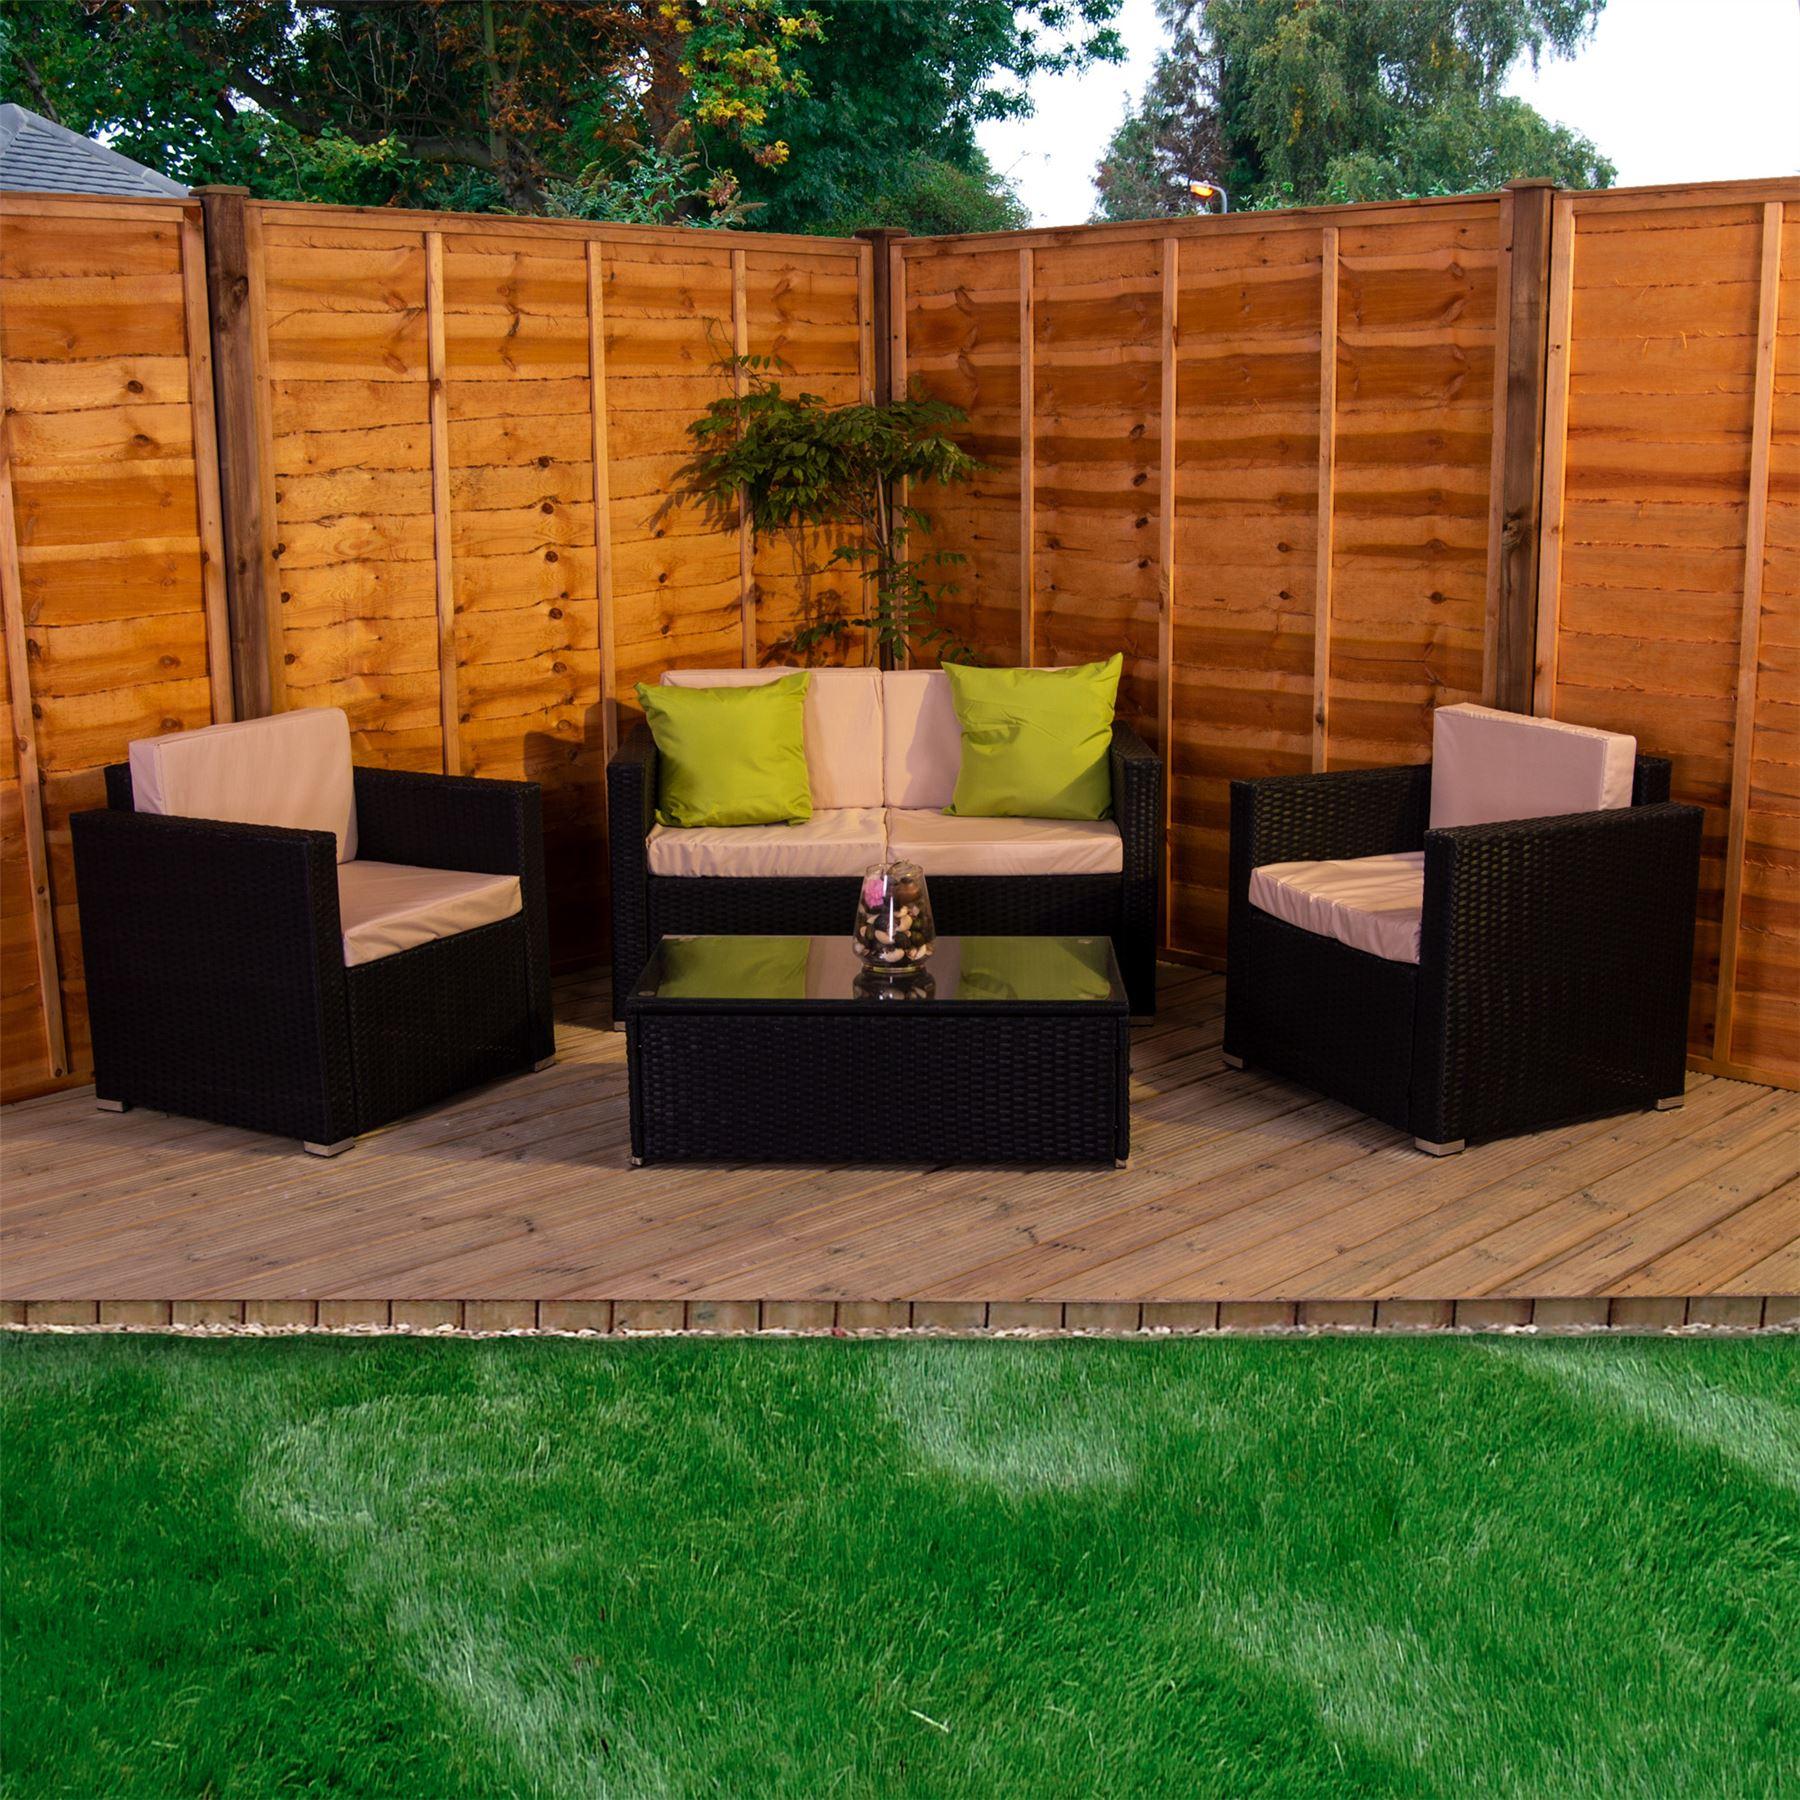 Alton Garden Rattan Furniture 4 Seater Set Black Brown ...